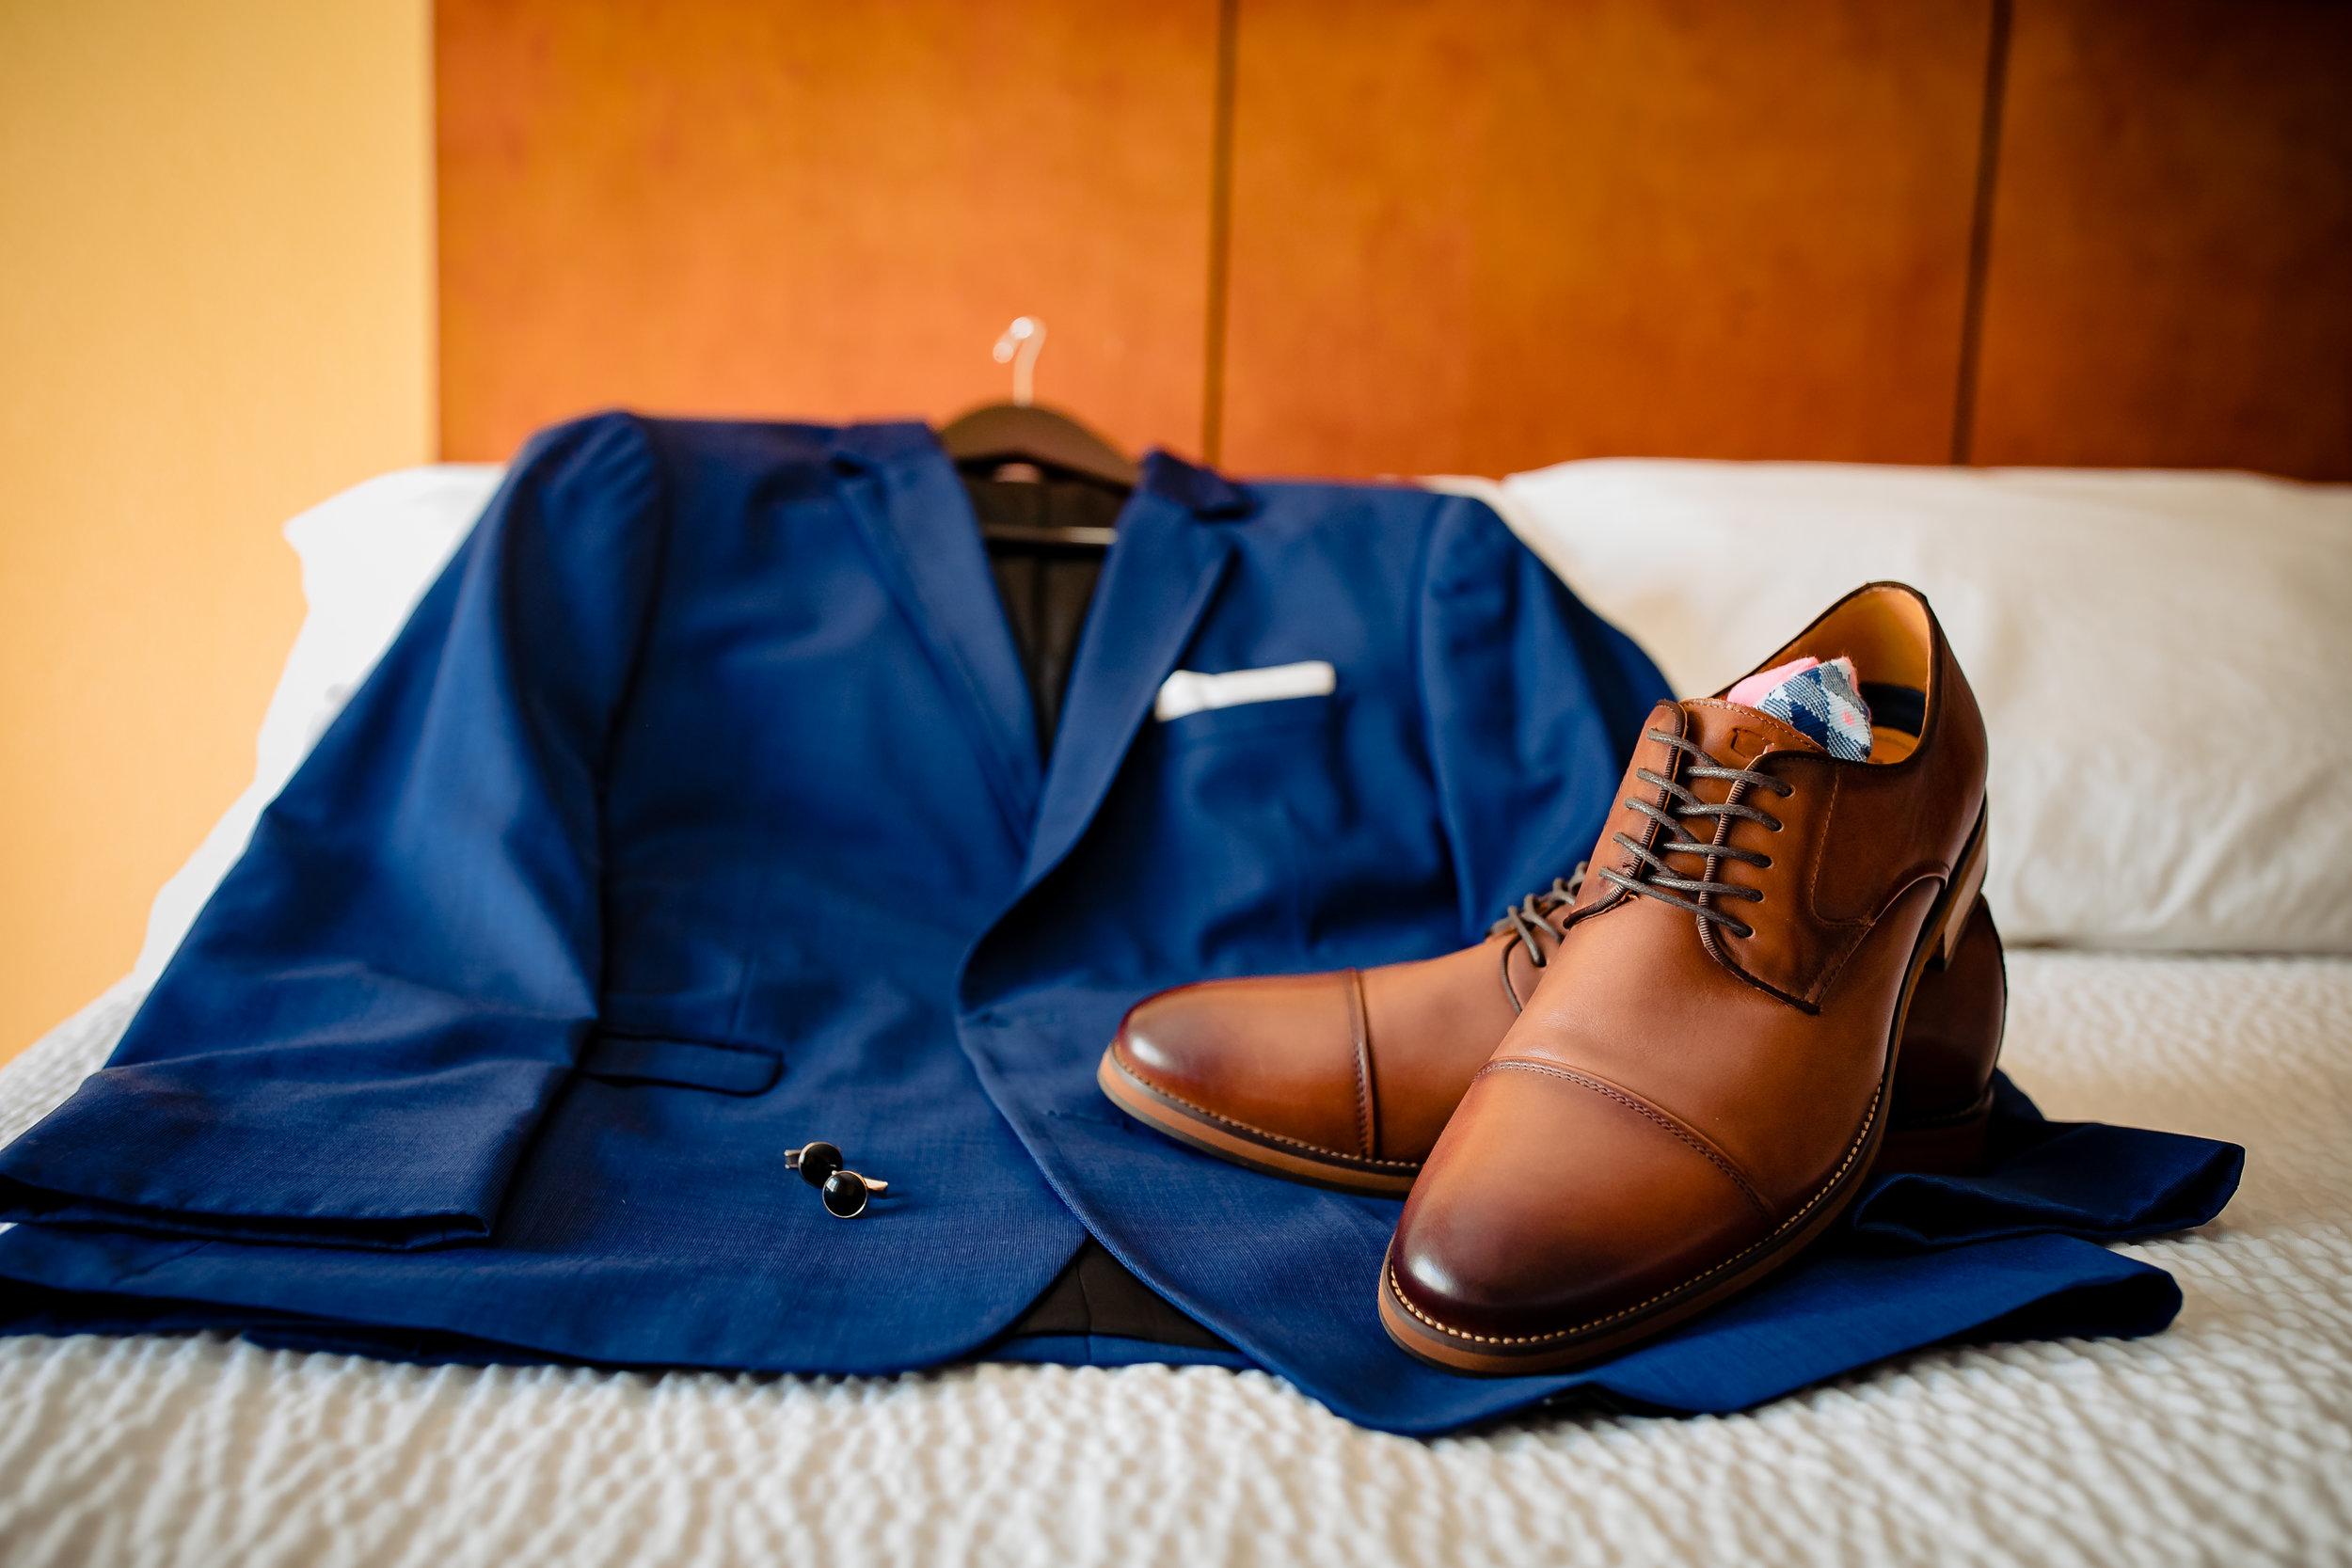 groom, tuxedo, shoes, tie, details